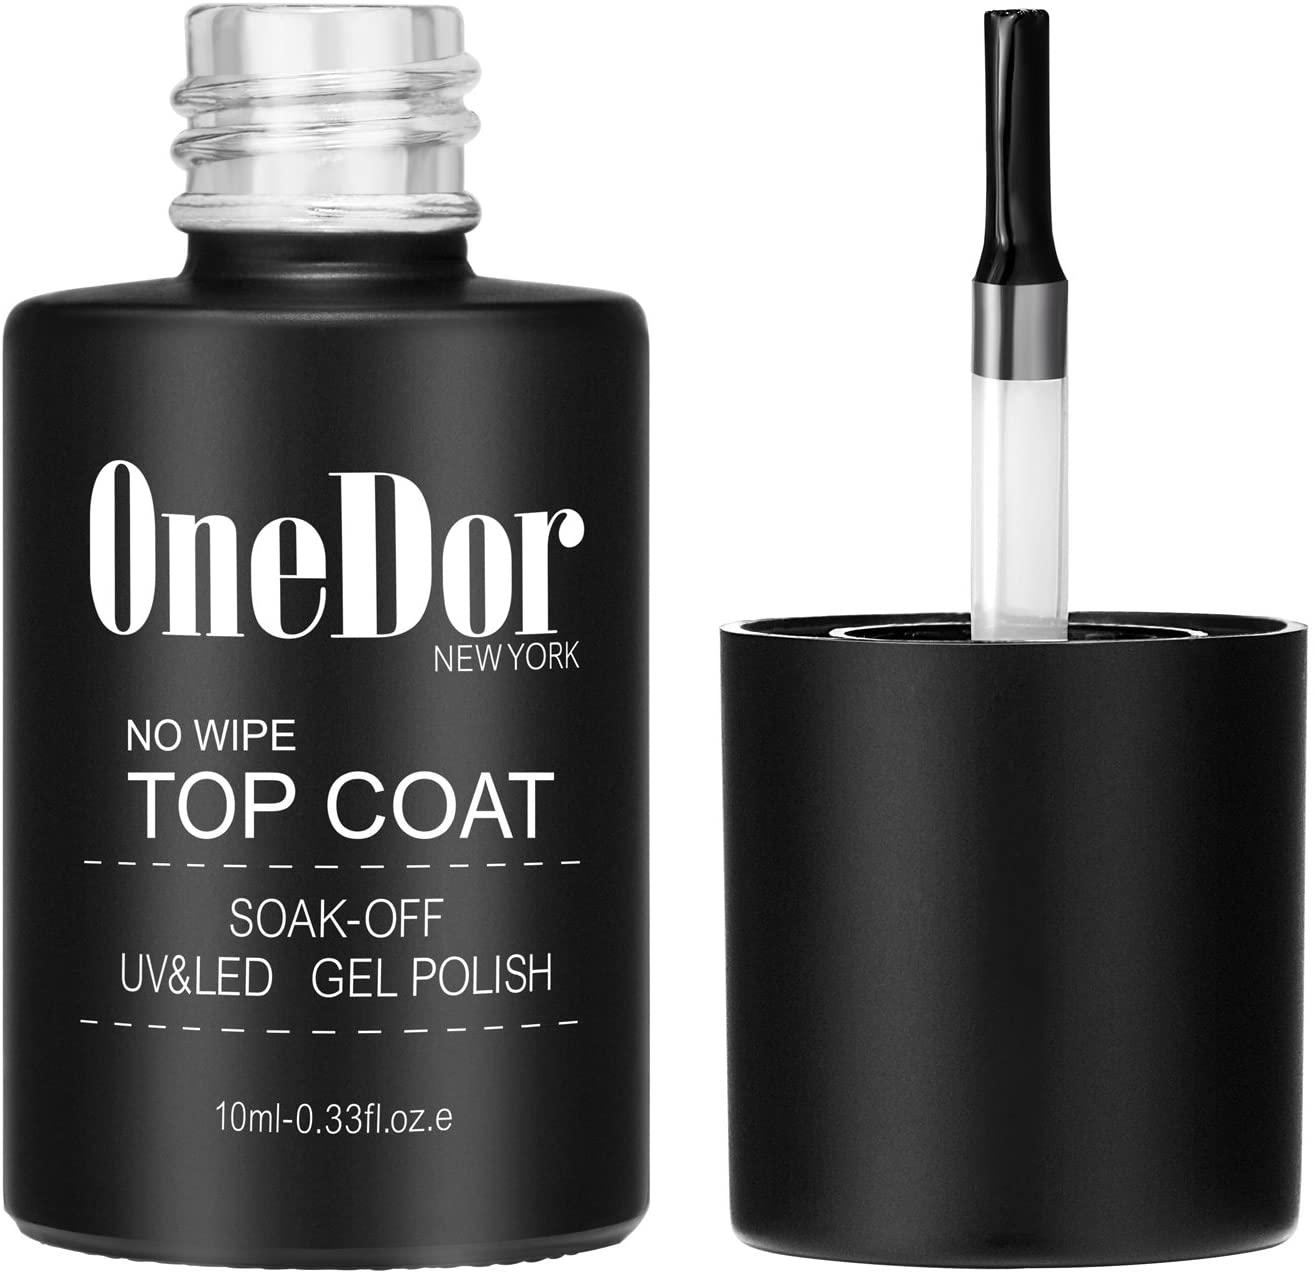 OneDor One Step No Wipe Top Coat Gel Polish, UV Led Cured Required Soak Off Gel Nail Polish (No Wipe Top Coat)